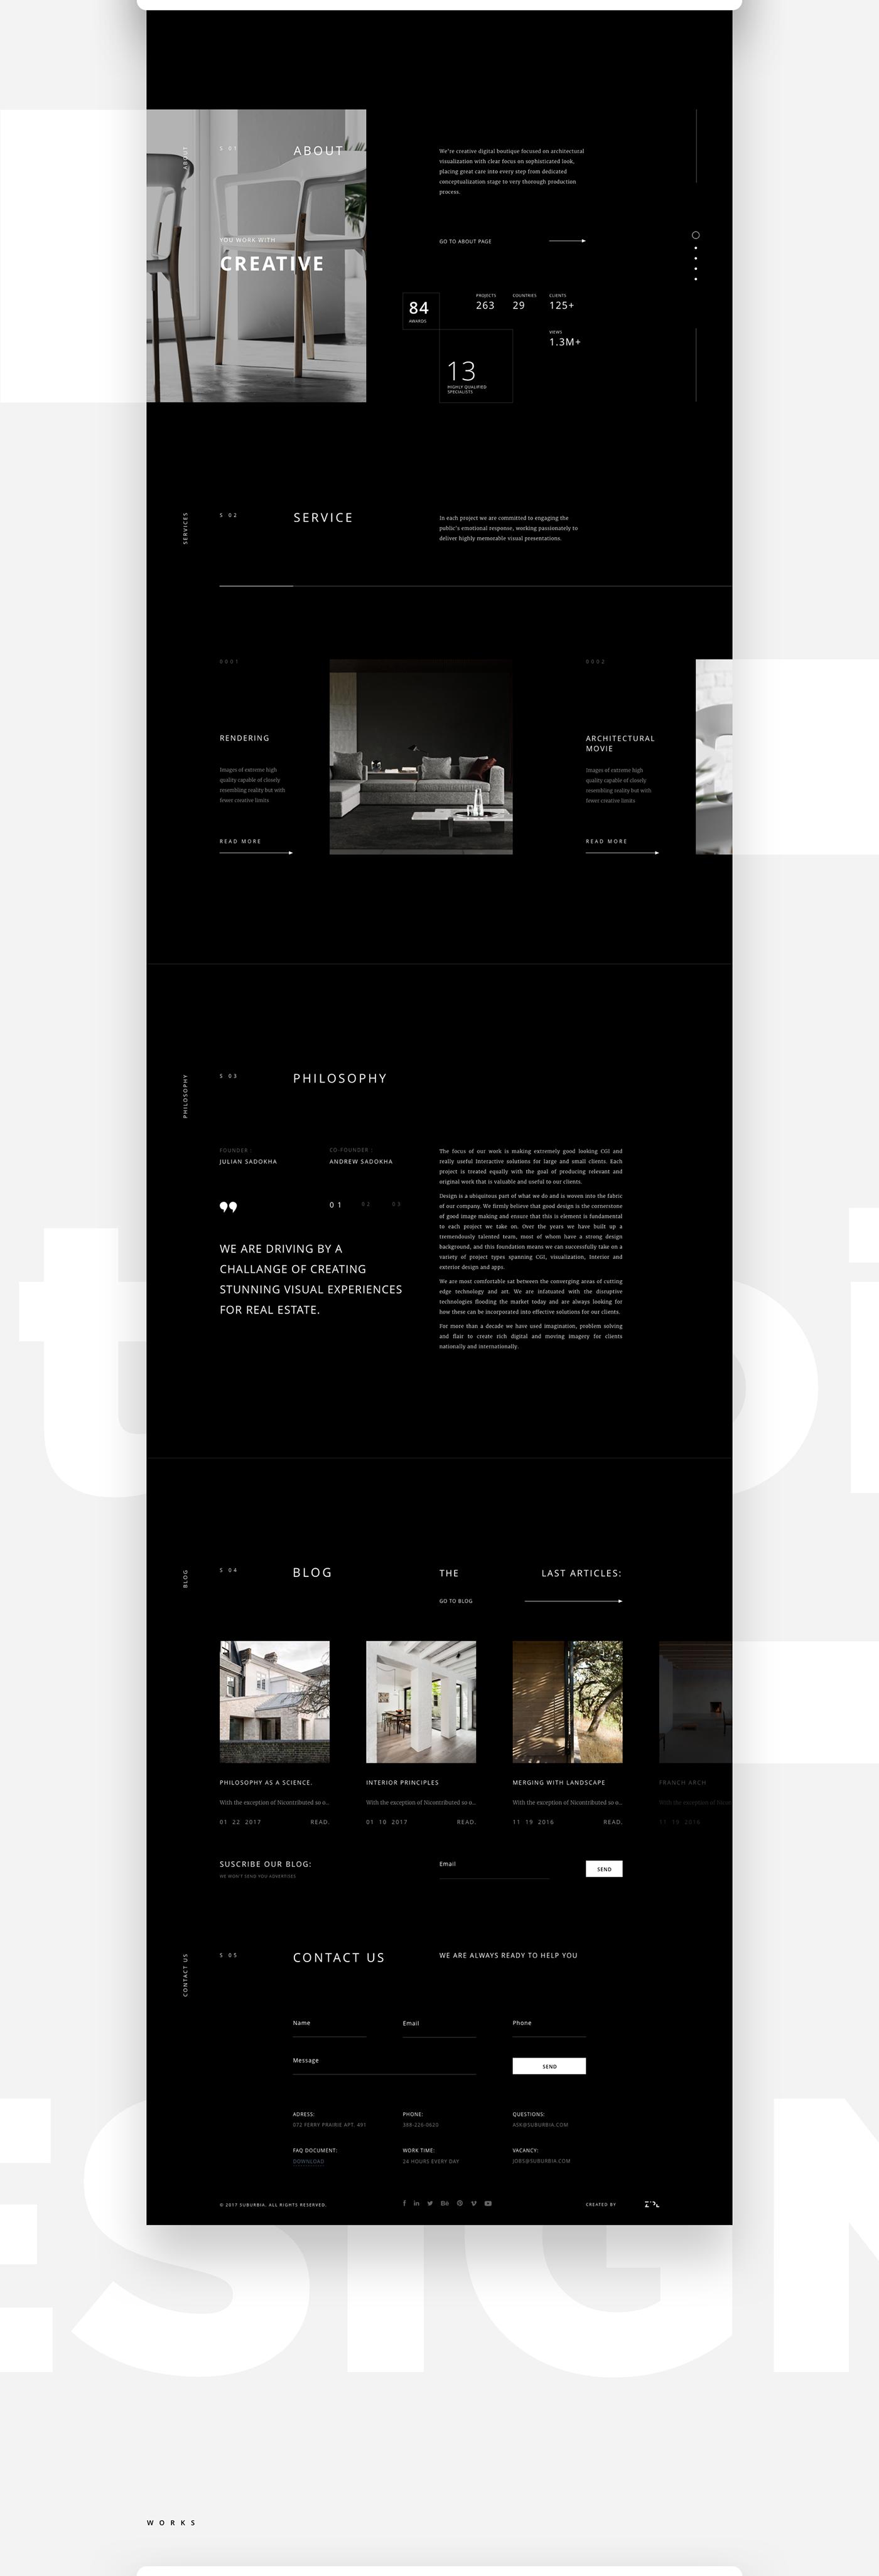 portfolio,architecture,Website,zipl,service,grid,slider,design,black,Project